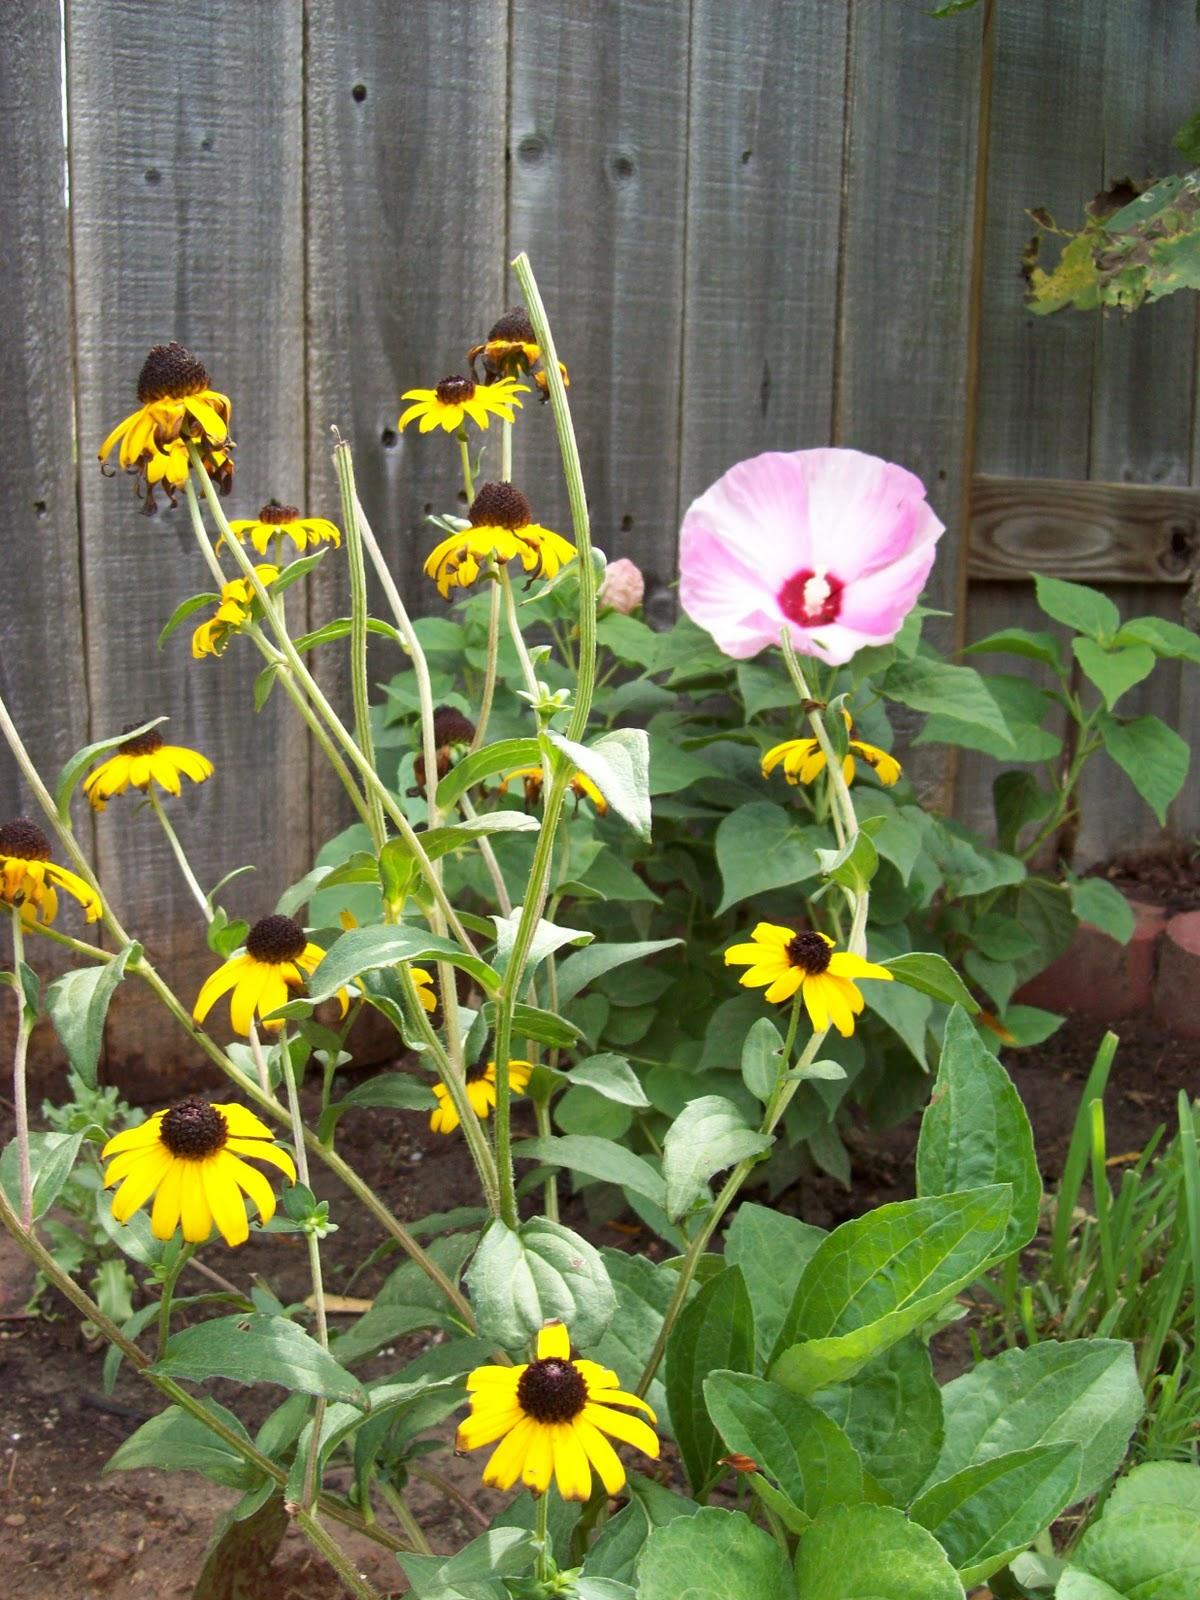 Gardening 2009 - 101_4787.JPG